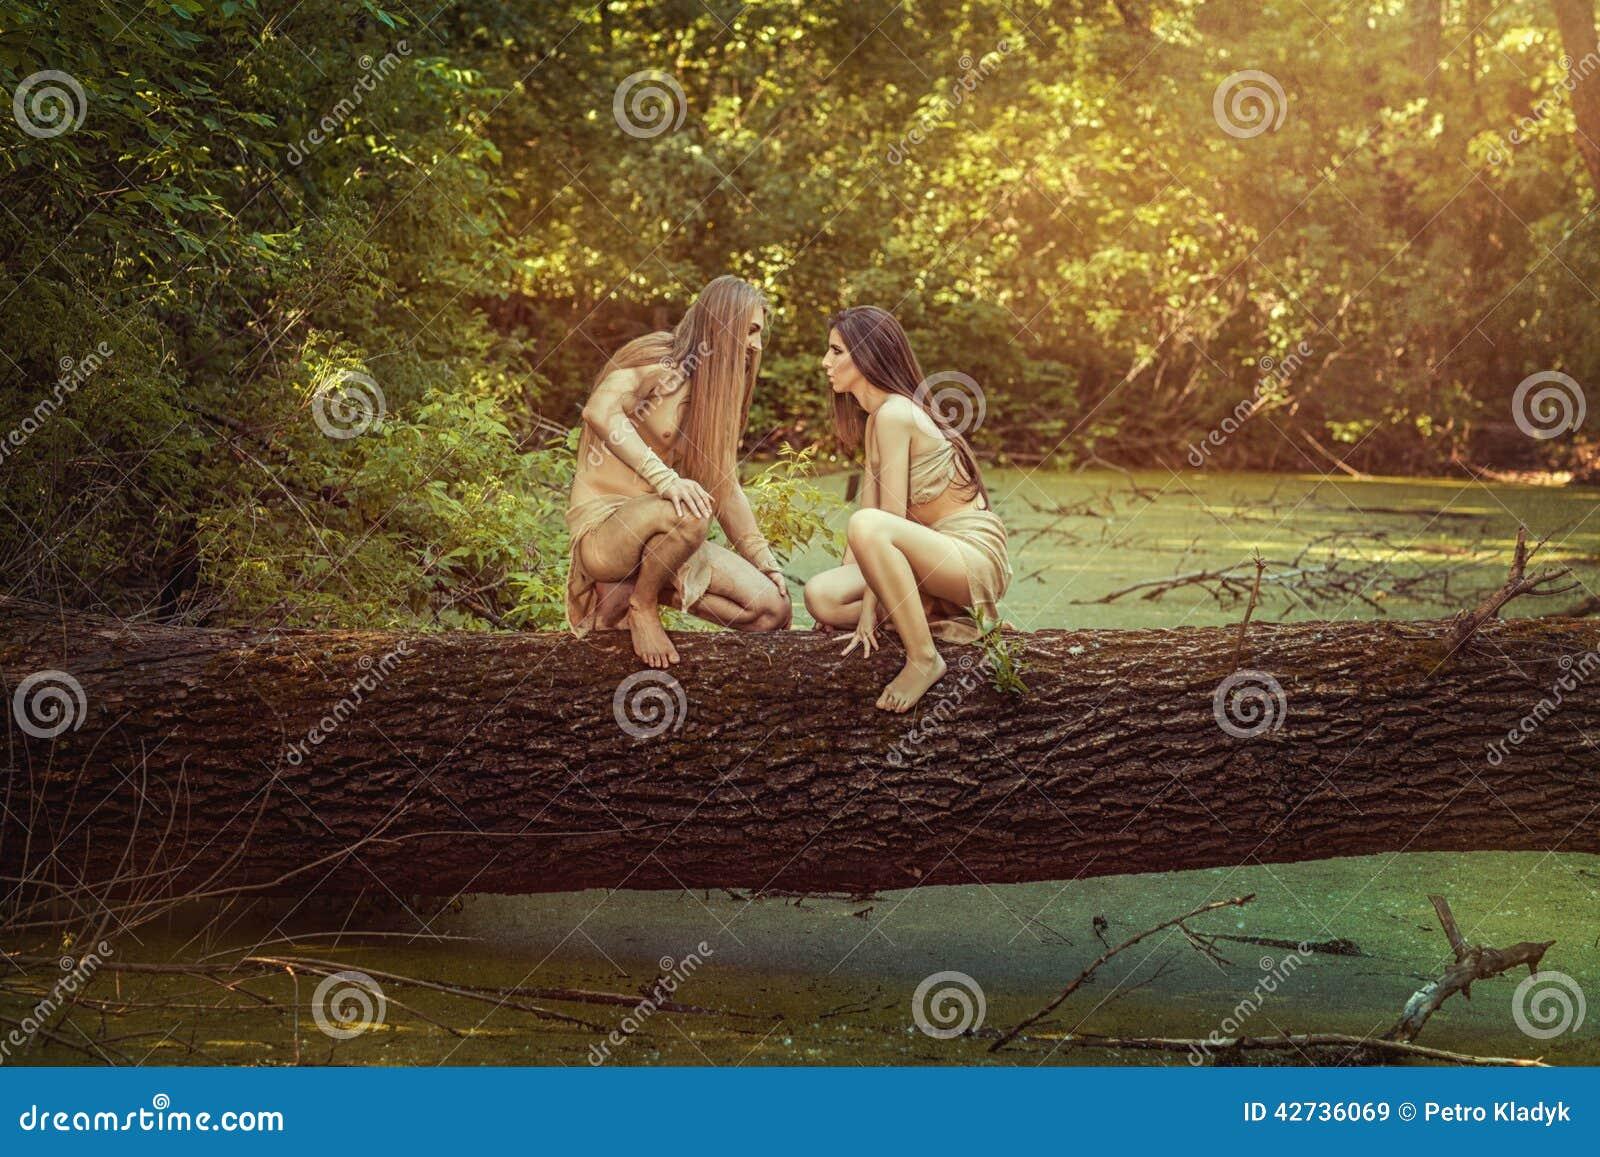 Wild men in the woods stock photo image 42736069